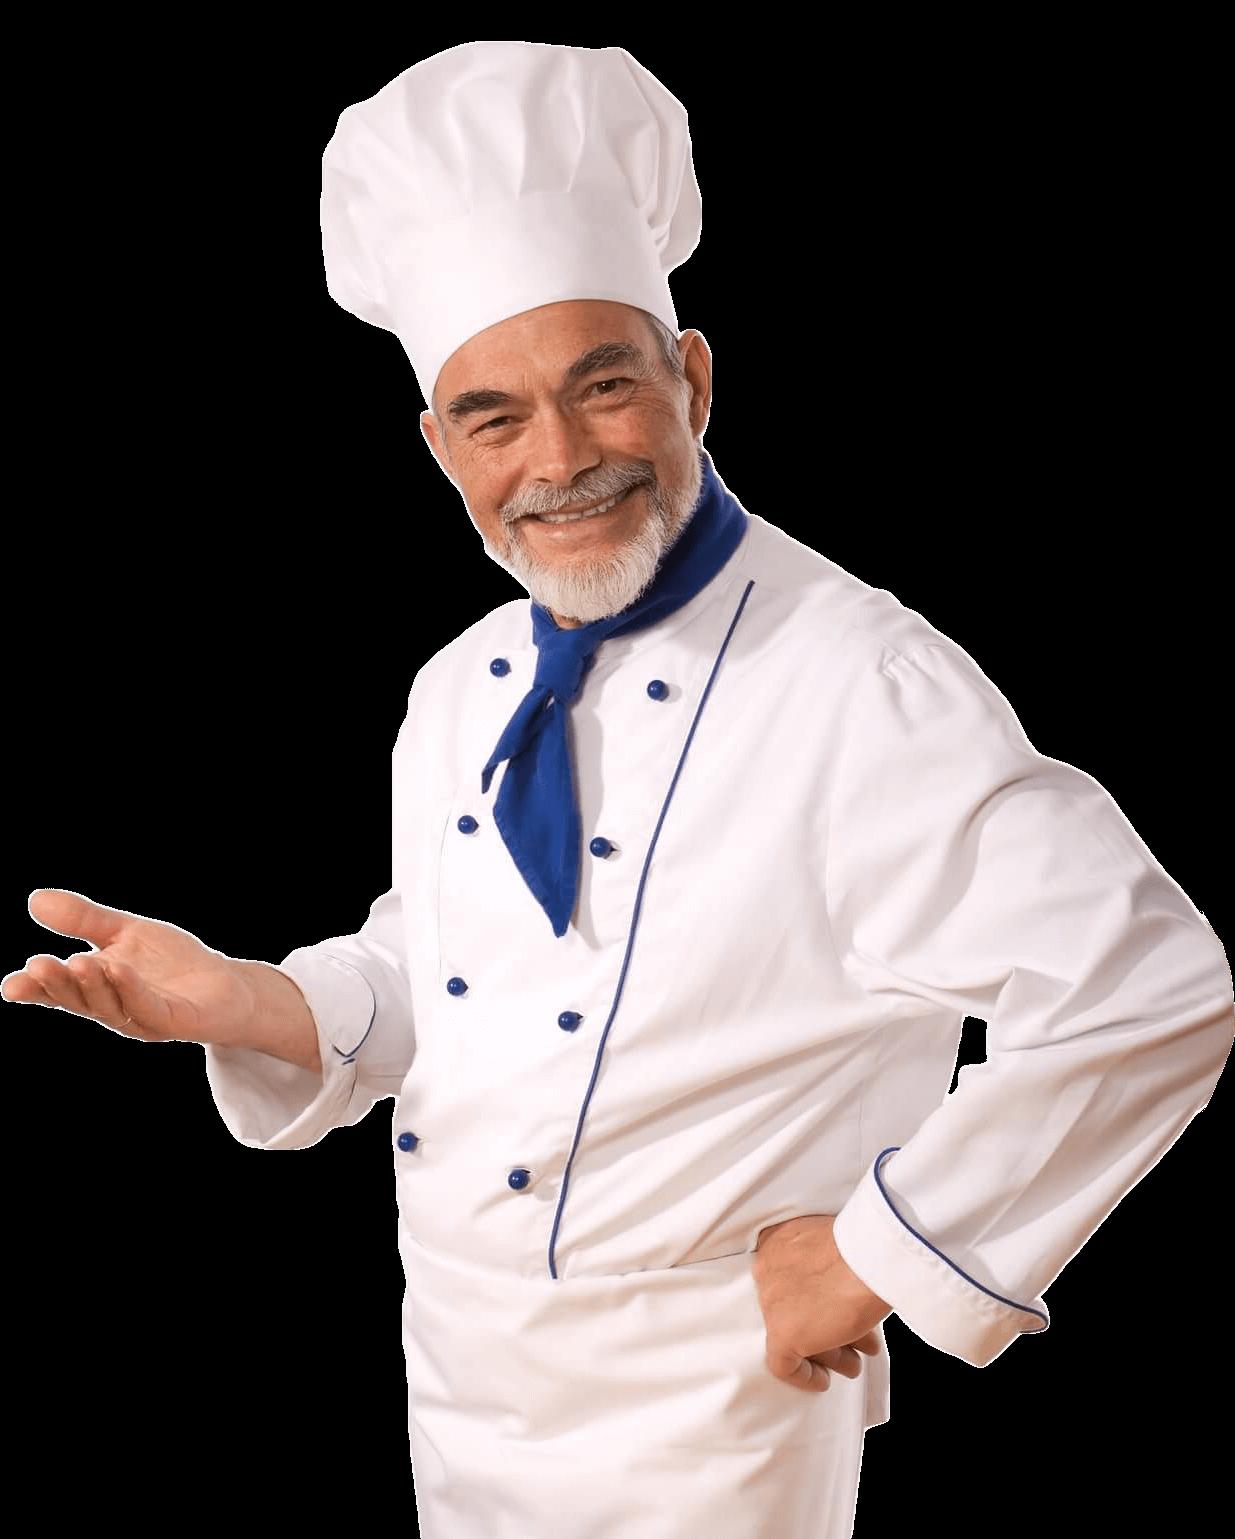 chef-cuistot-slide-kochconnect